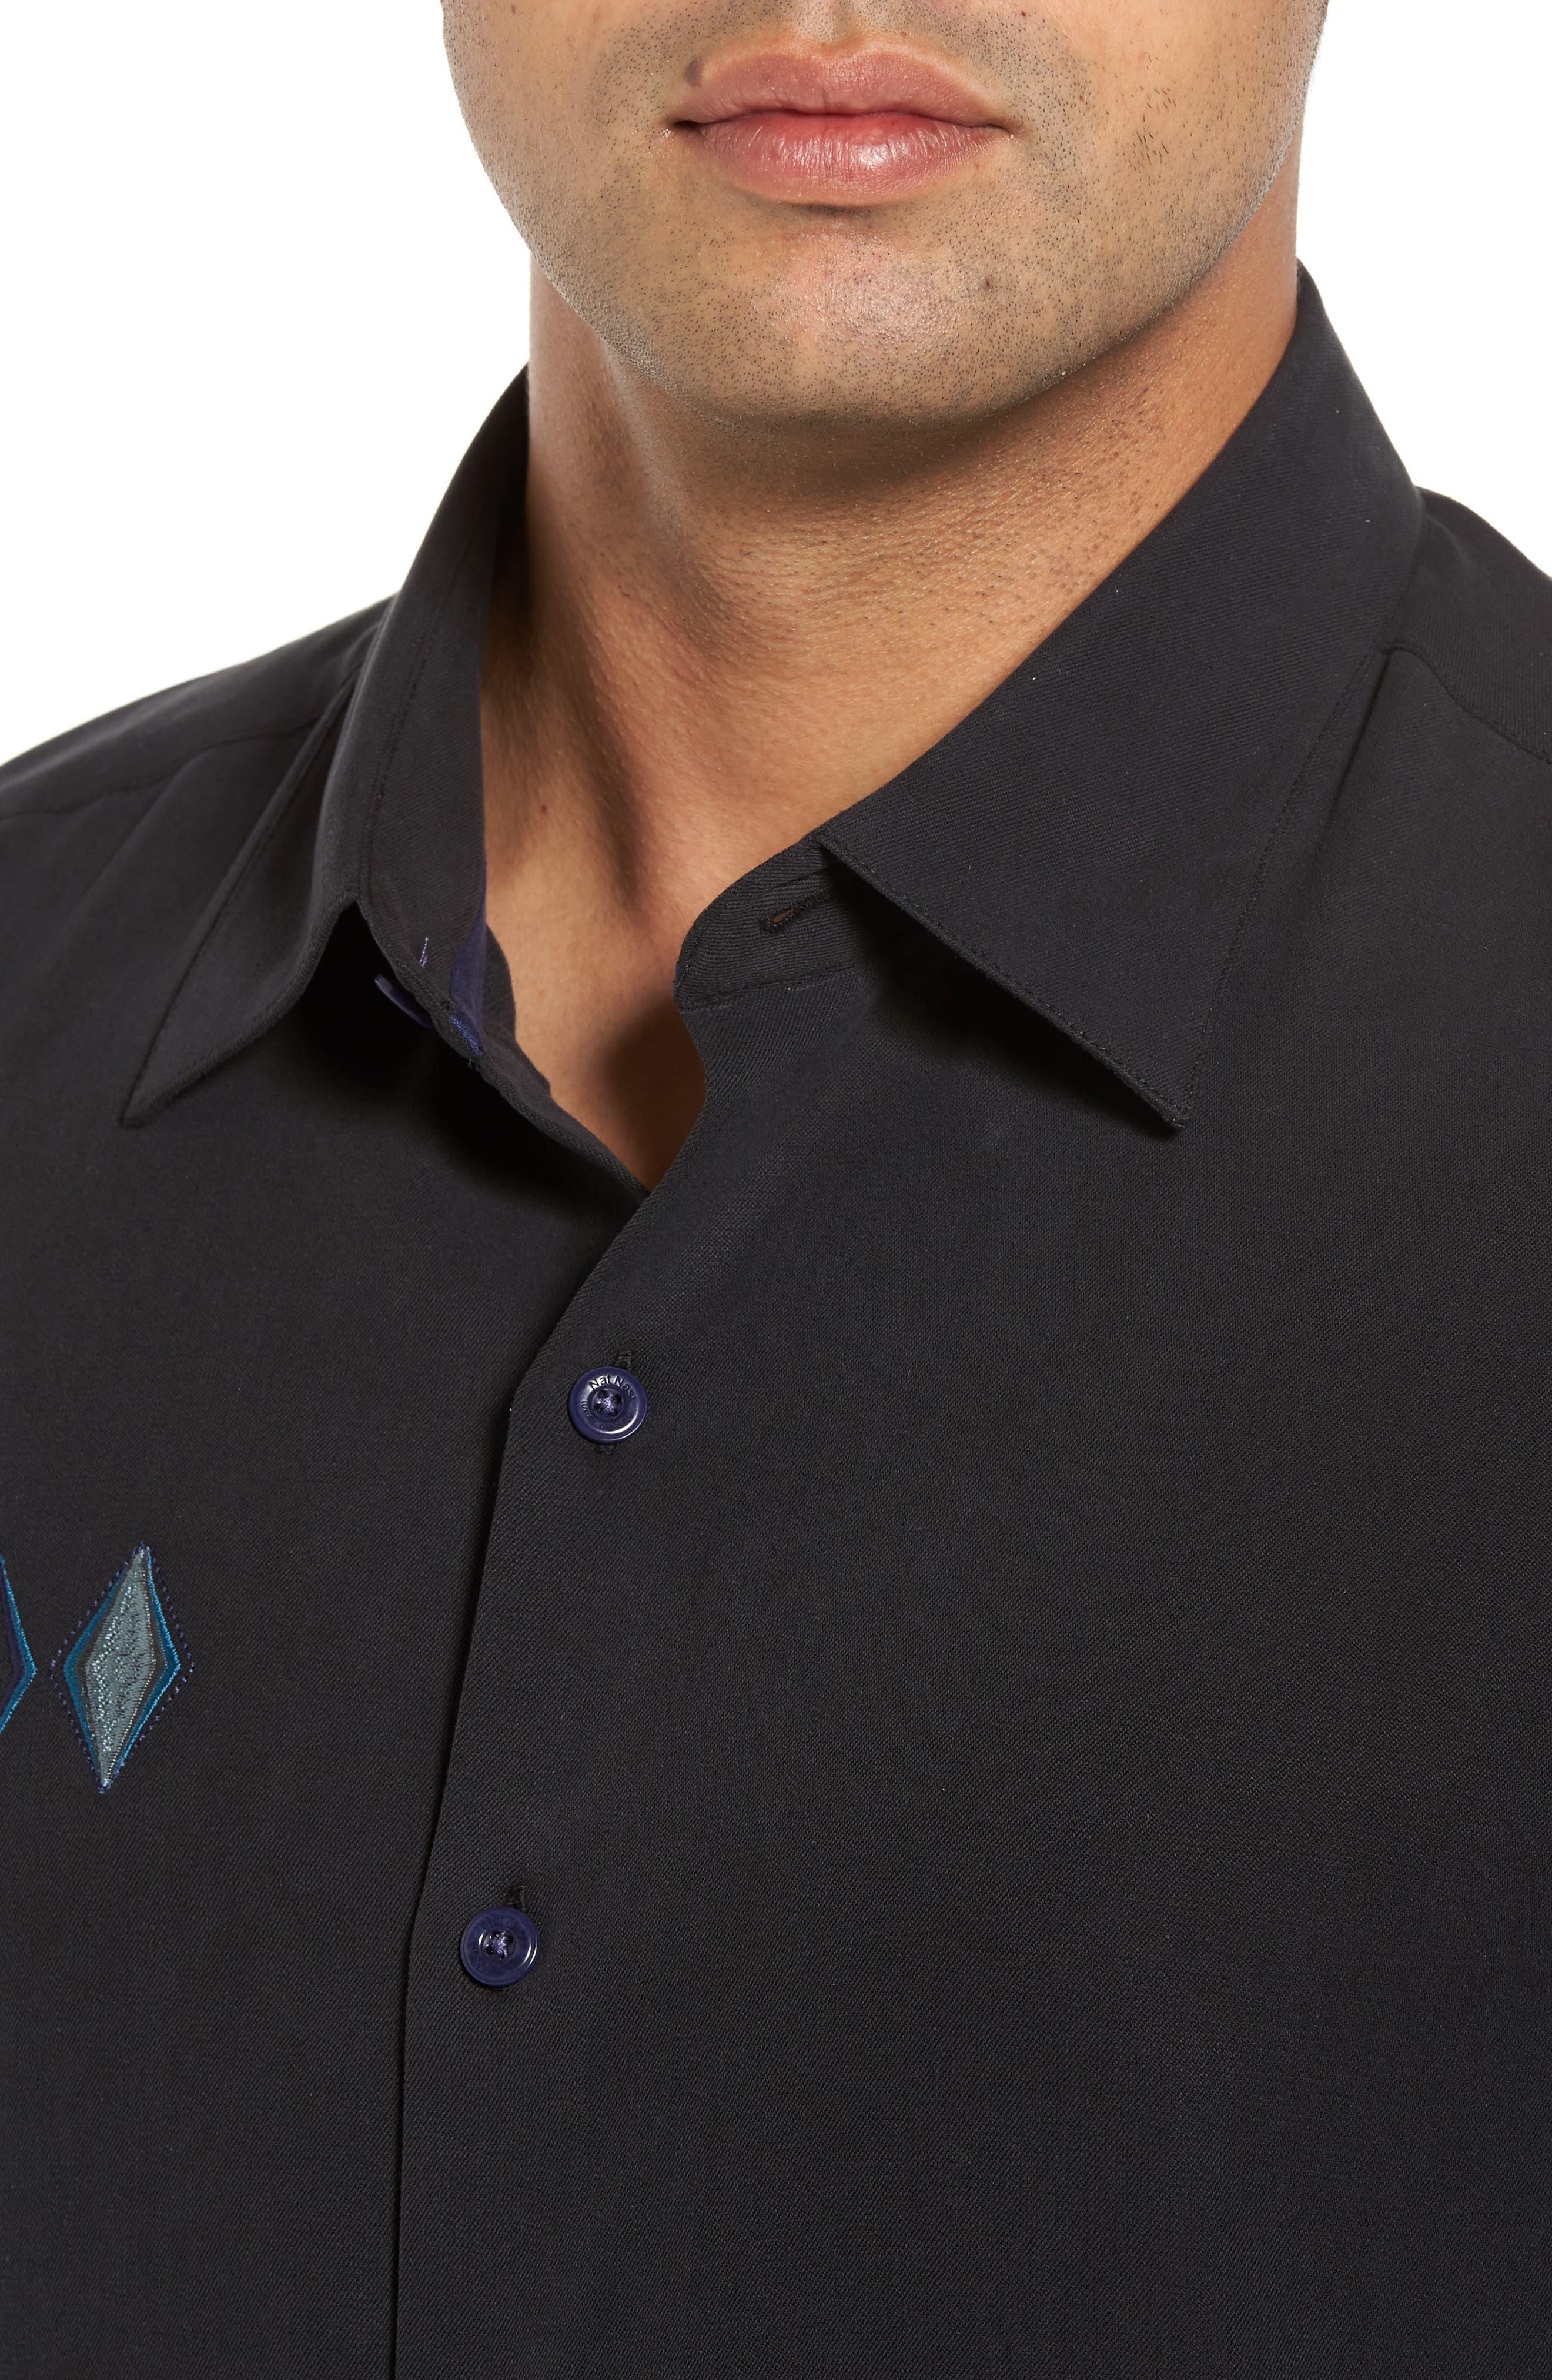 Black Diamond Regular Fit Embroidered Silk Blend Sport Shirt,                             Alternate thumbnail 4, color,                             001